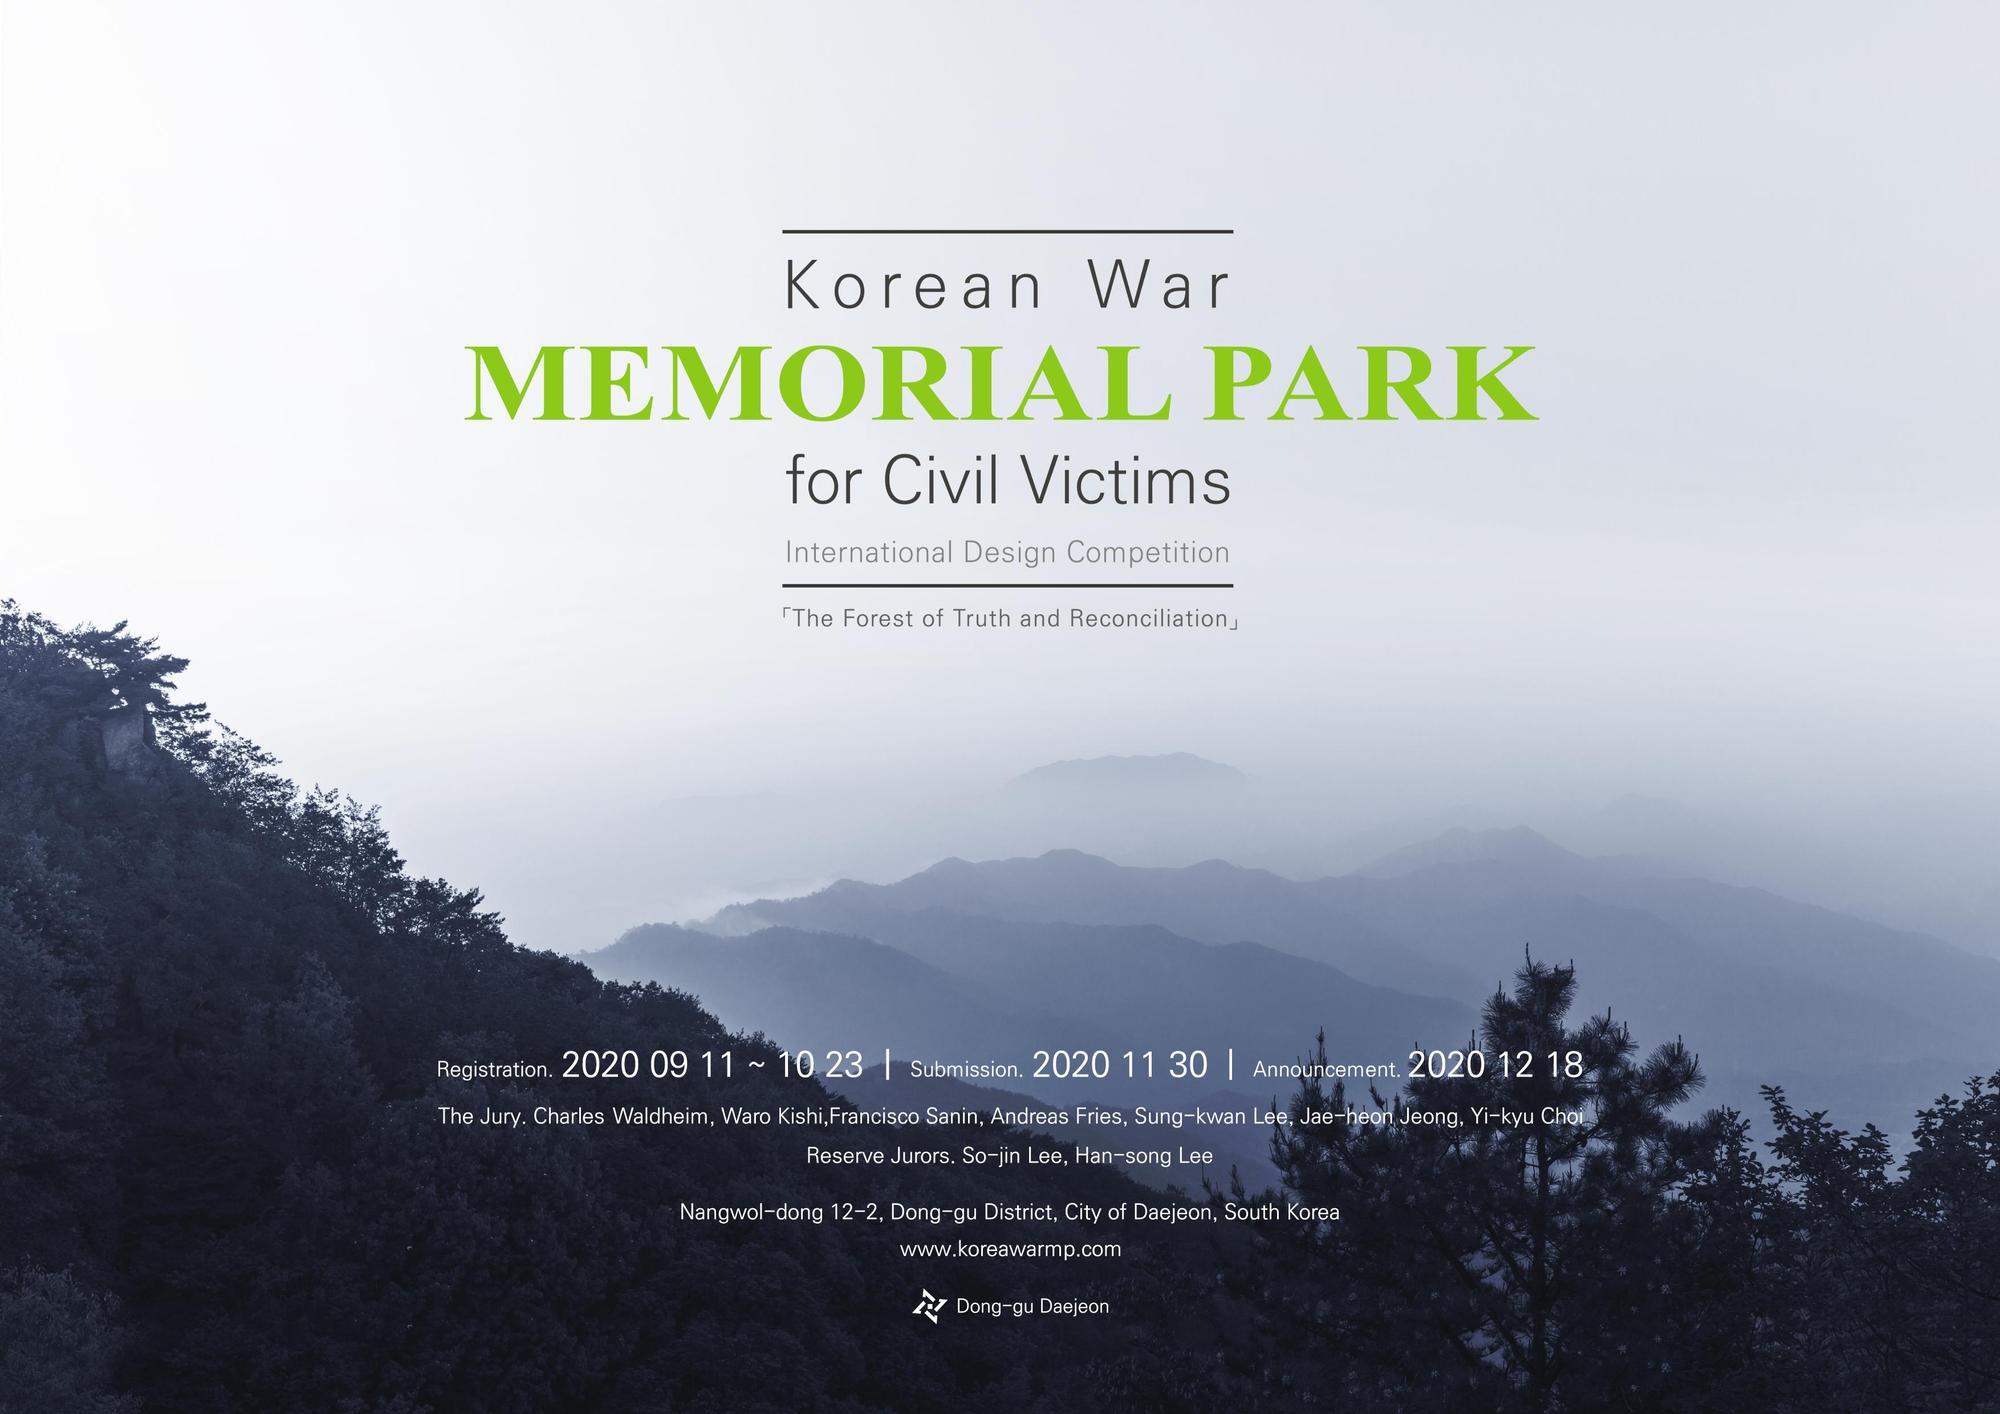 International Design Competition for Korean War Memorial Park for Civil Victims